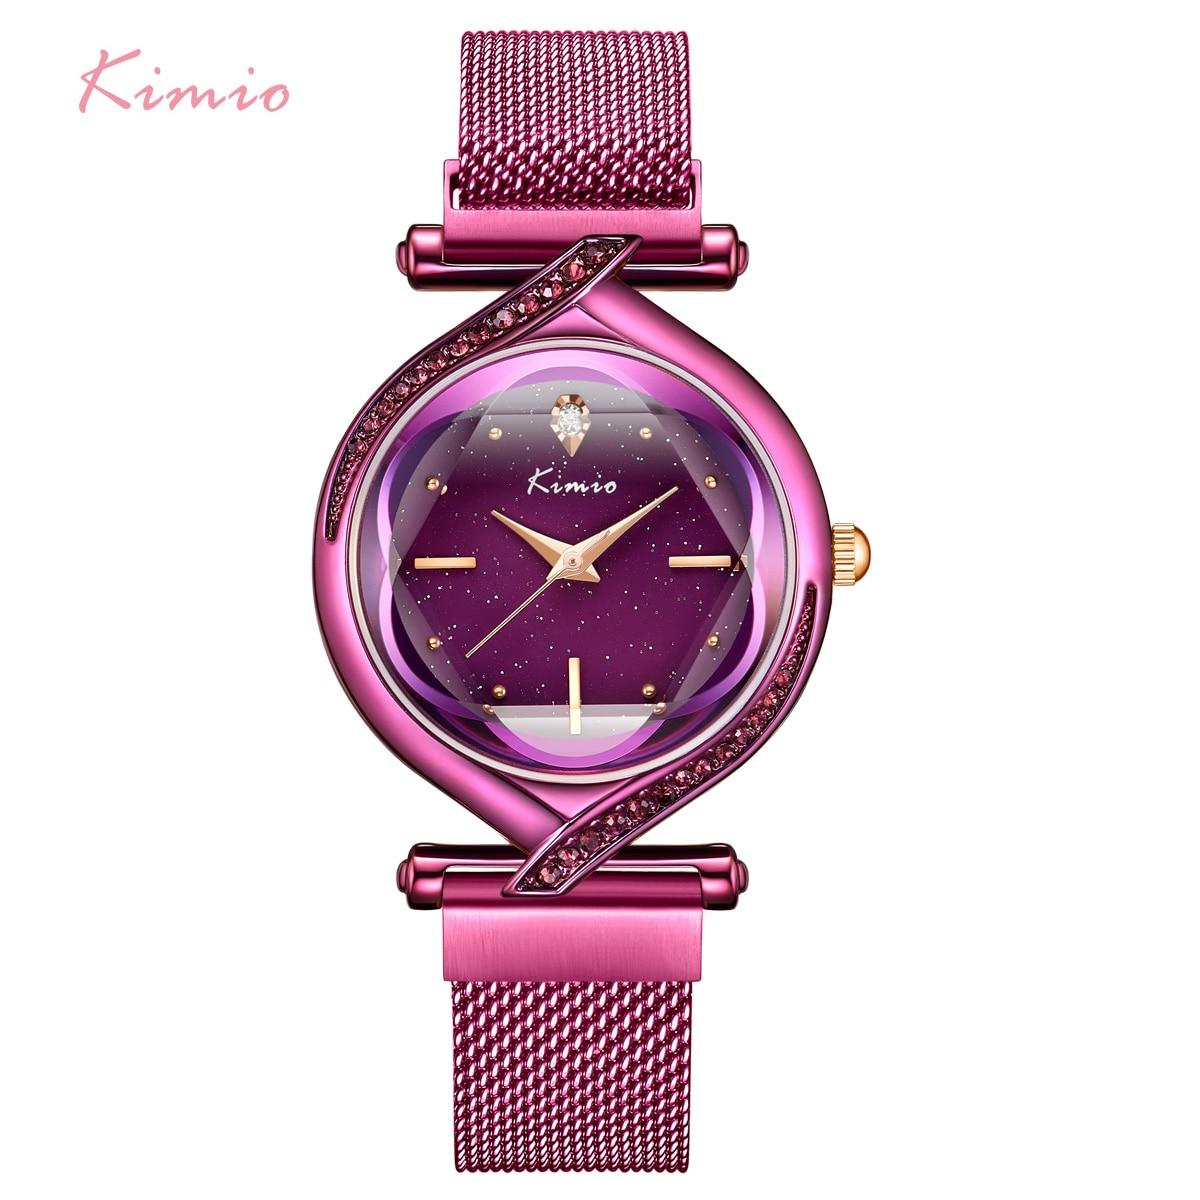 Kimio Woman Creative Watches Luxury Brand Mesh Belt Ladies Quartz Women Watch Clock 2019 Starry Sky Magnet Strap Wristwatch